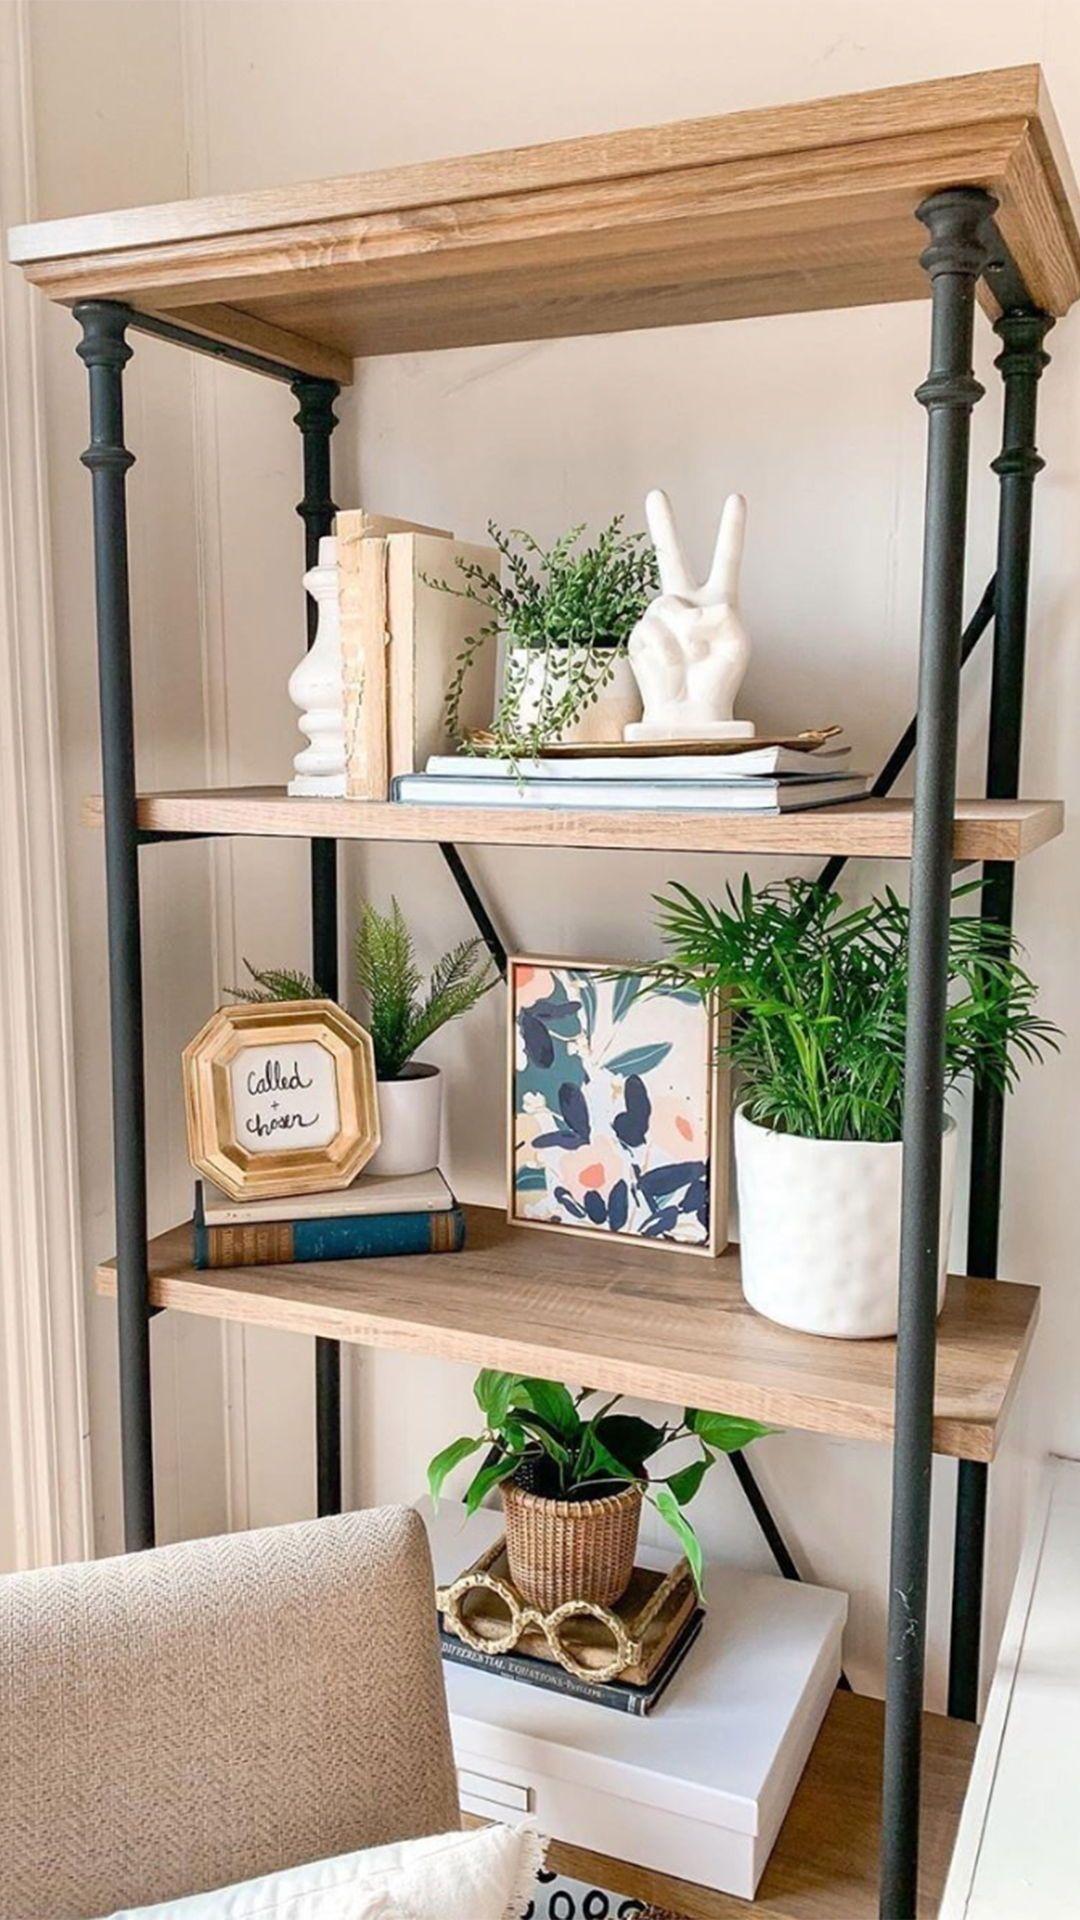 6688ed7d6ff65c4de7118e1f3bcecc8f - Better Homes And Gardens Mercer Bookshelf